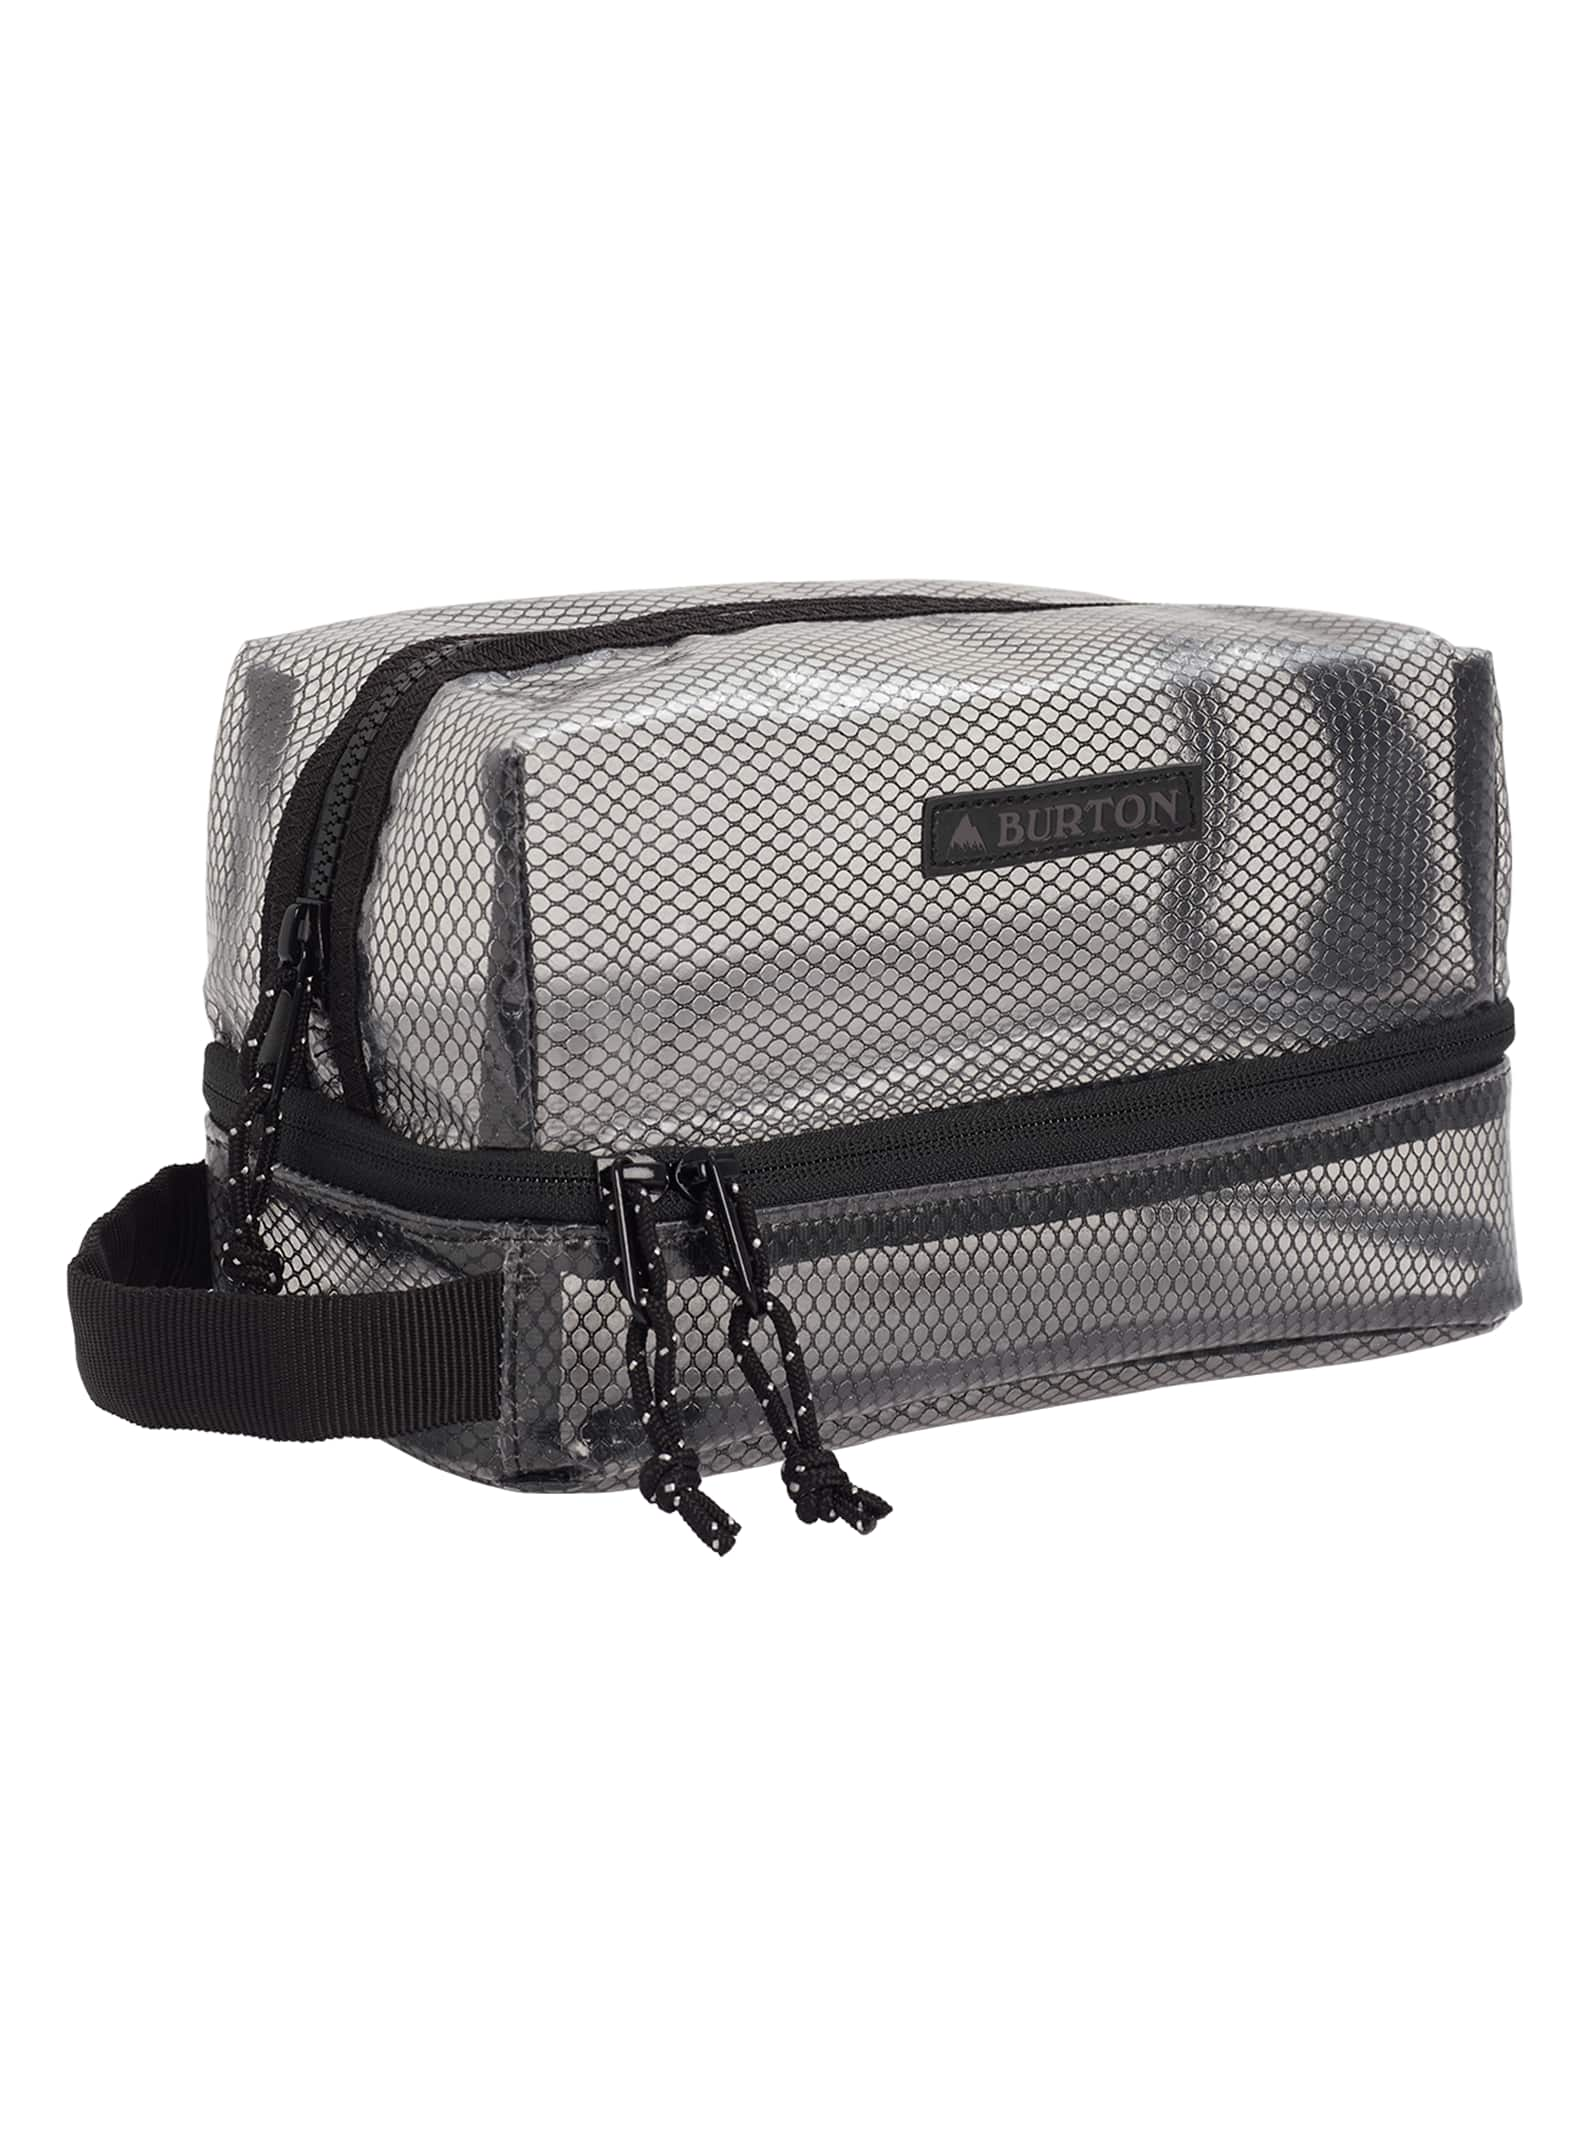 Burton Low Maintenance Kit 5L Accessory Bag, Clear